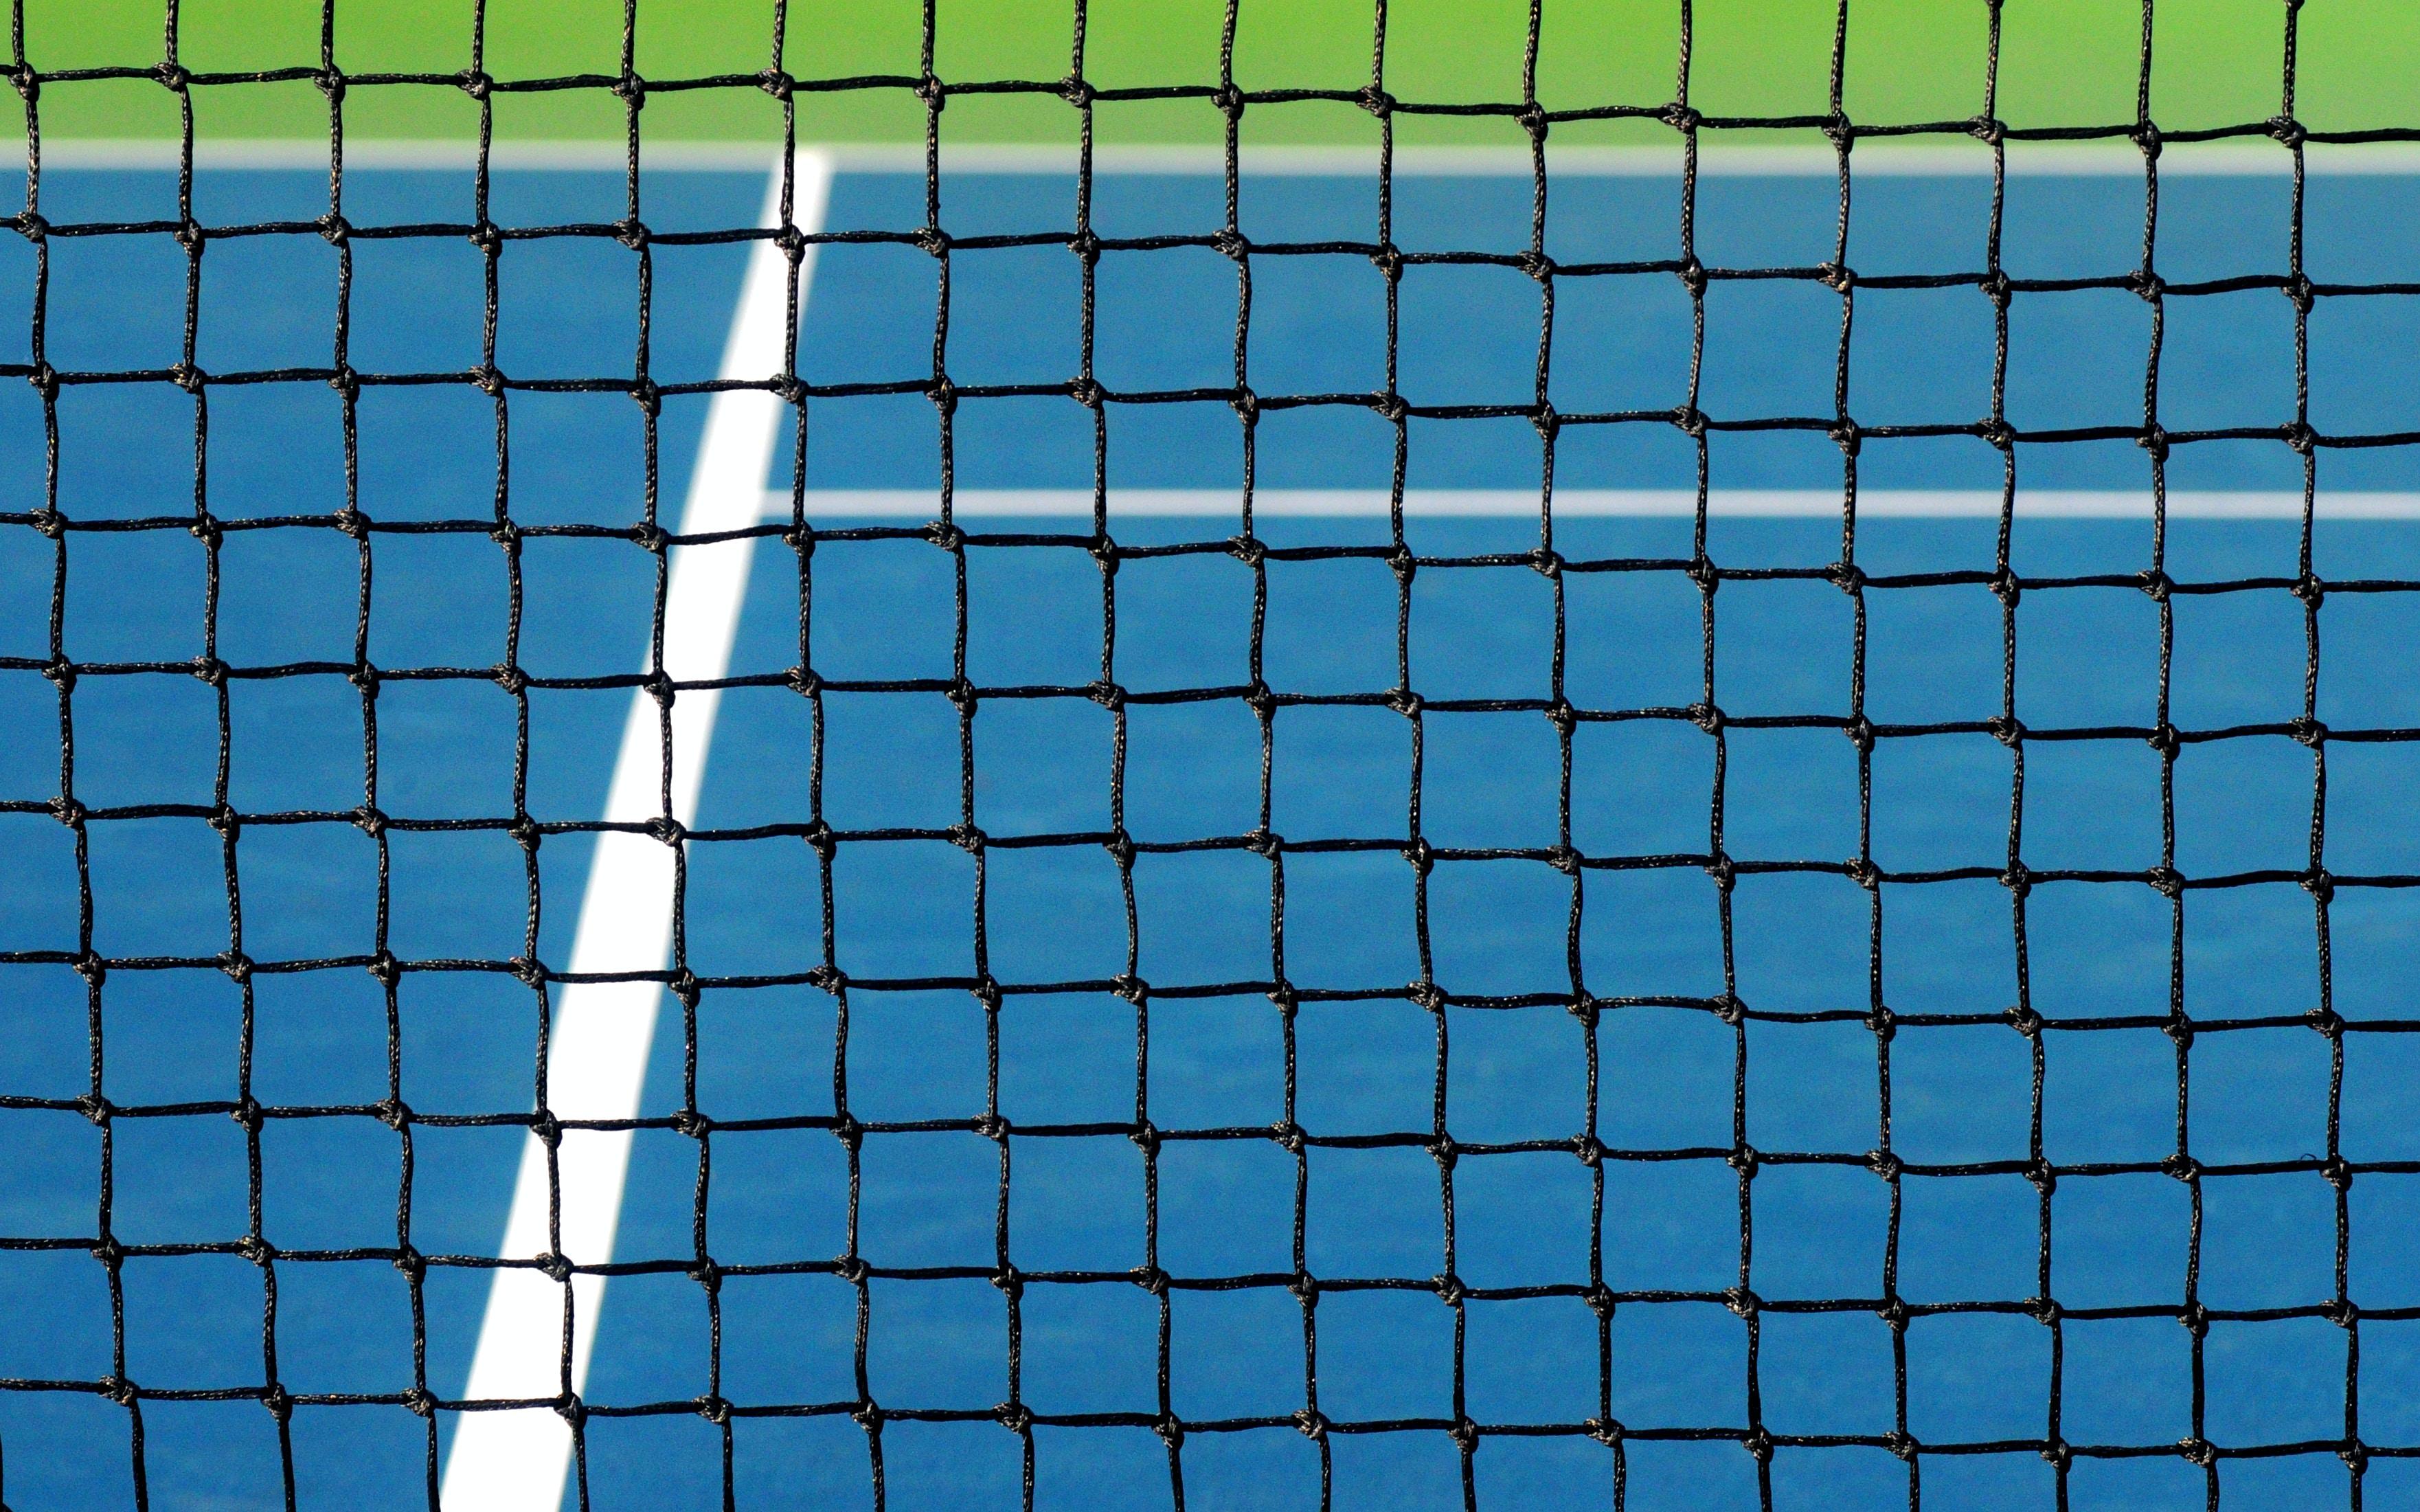 closeup photo of tennis net